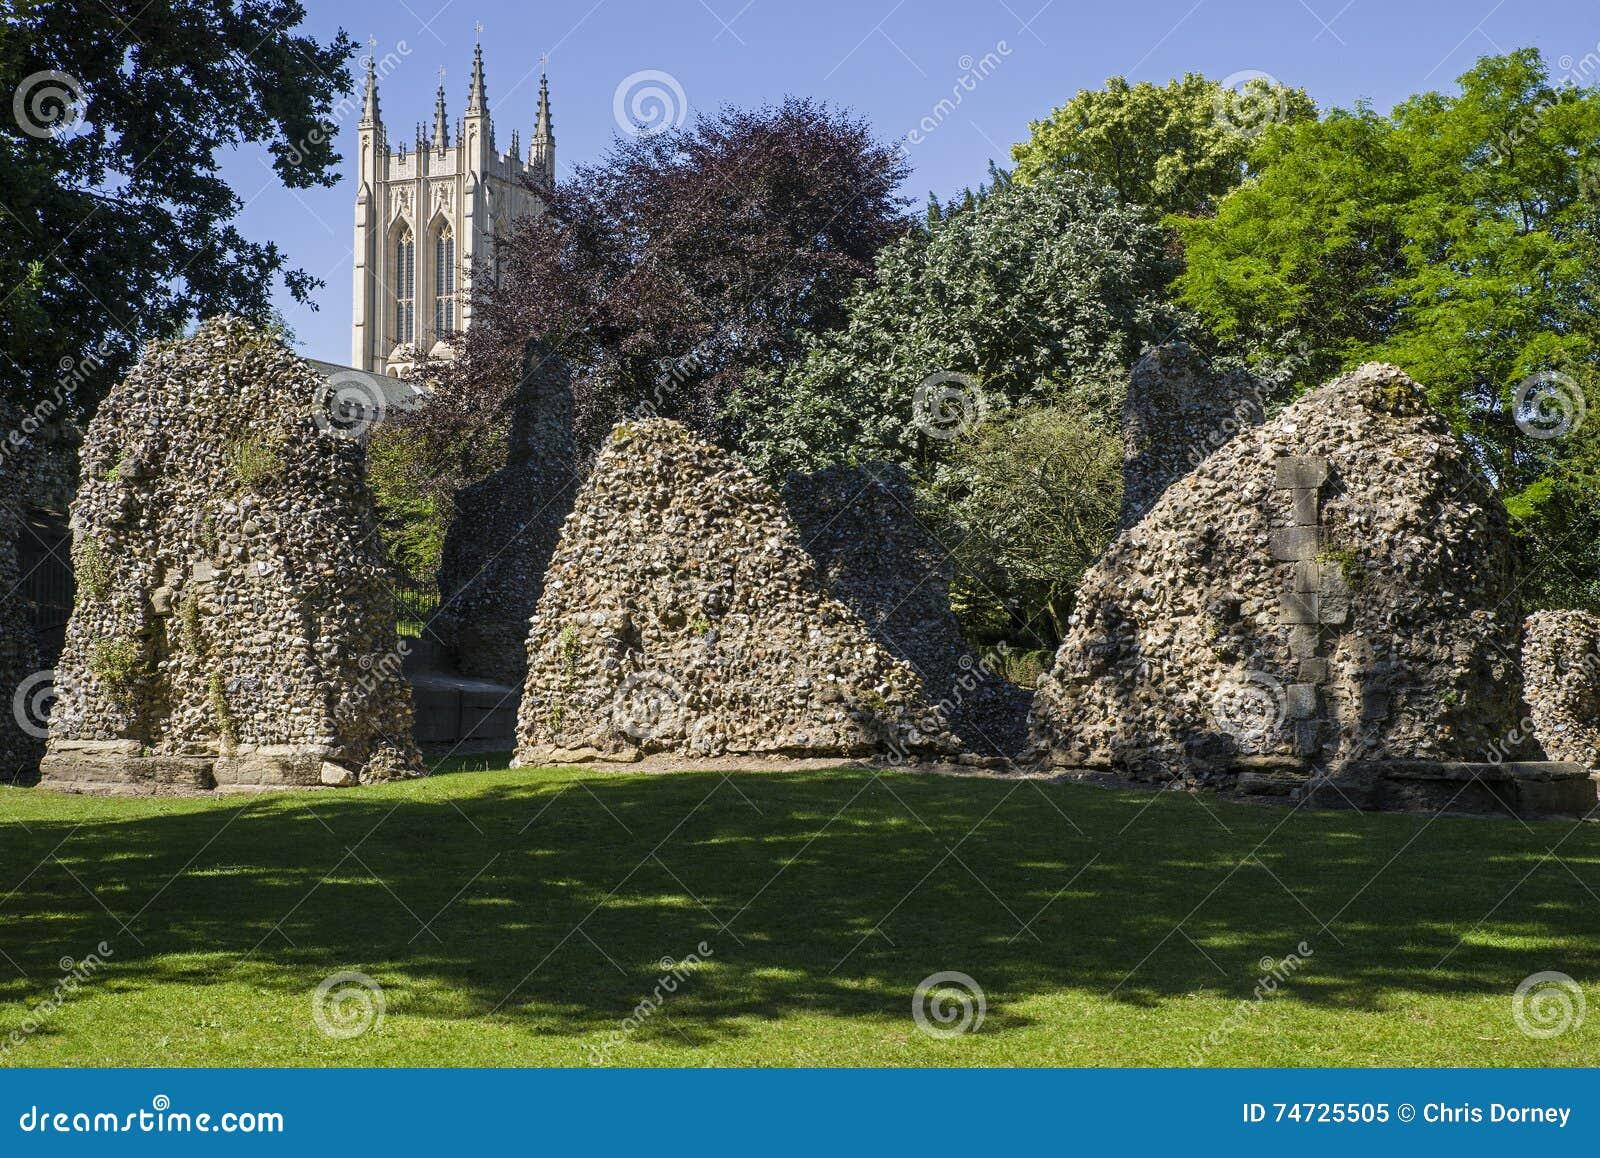 Kathedrale Bedecken-St. Edmunds Abbey Remains und St. Edmundsbury